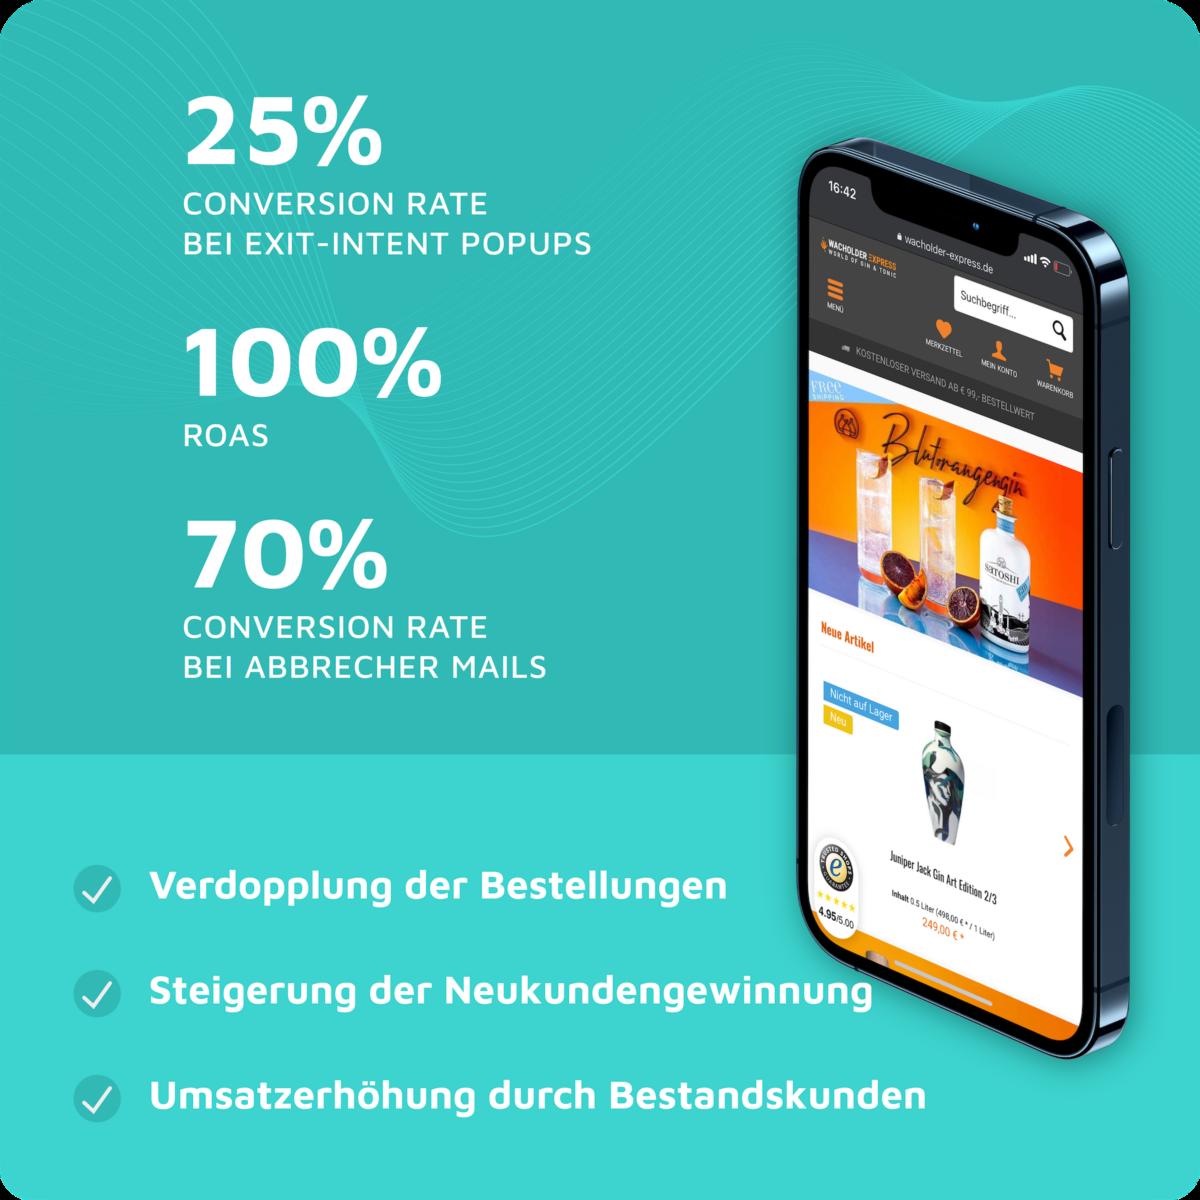 Wachholder Express Online Shop reduziert Kaufabbrüche